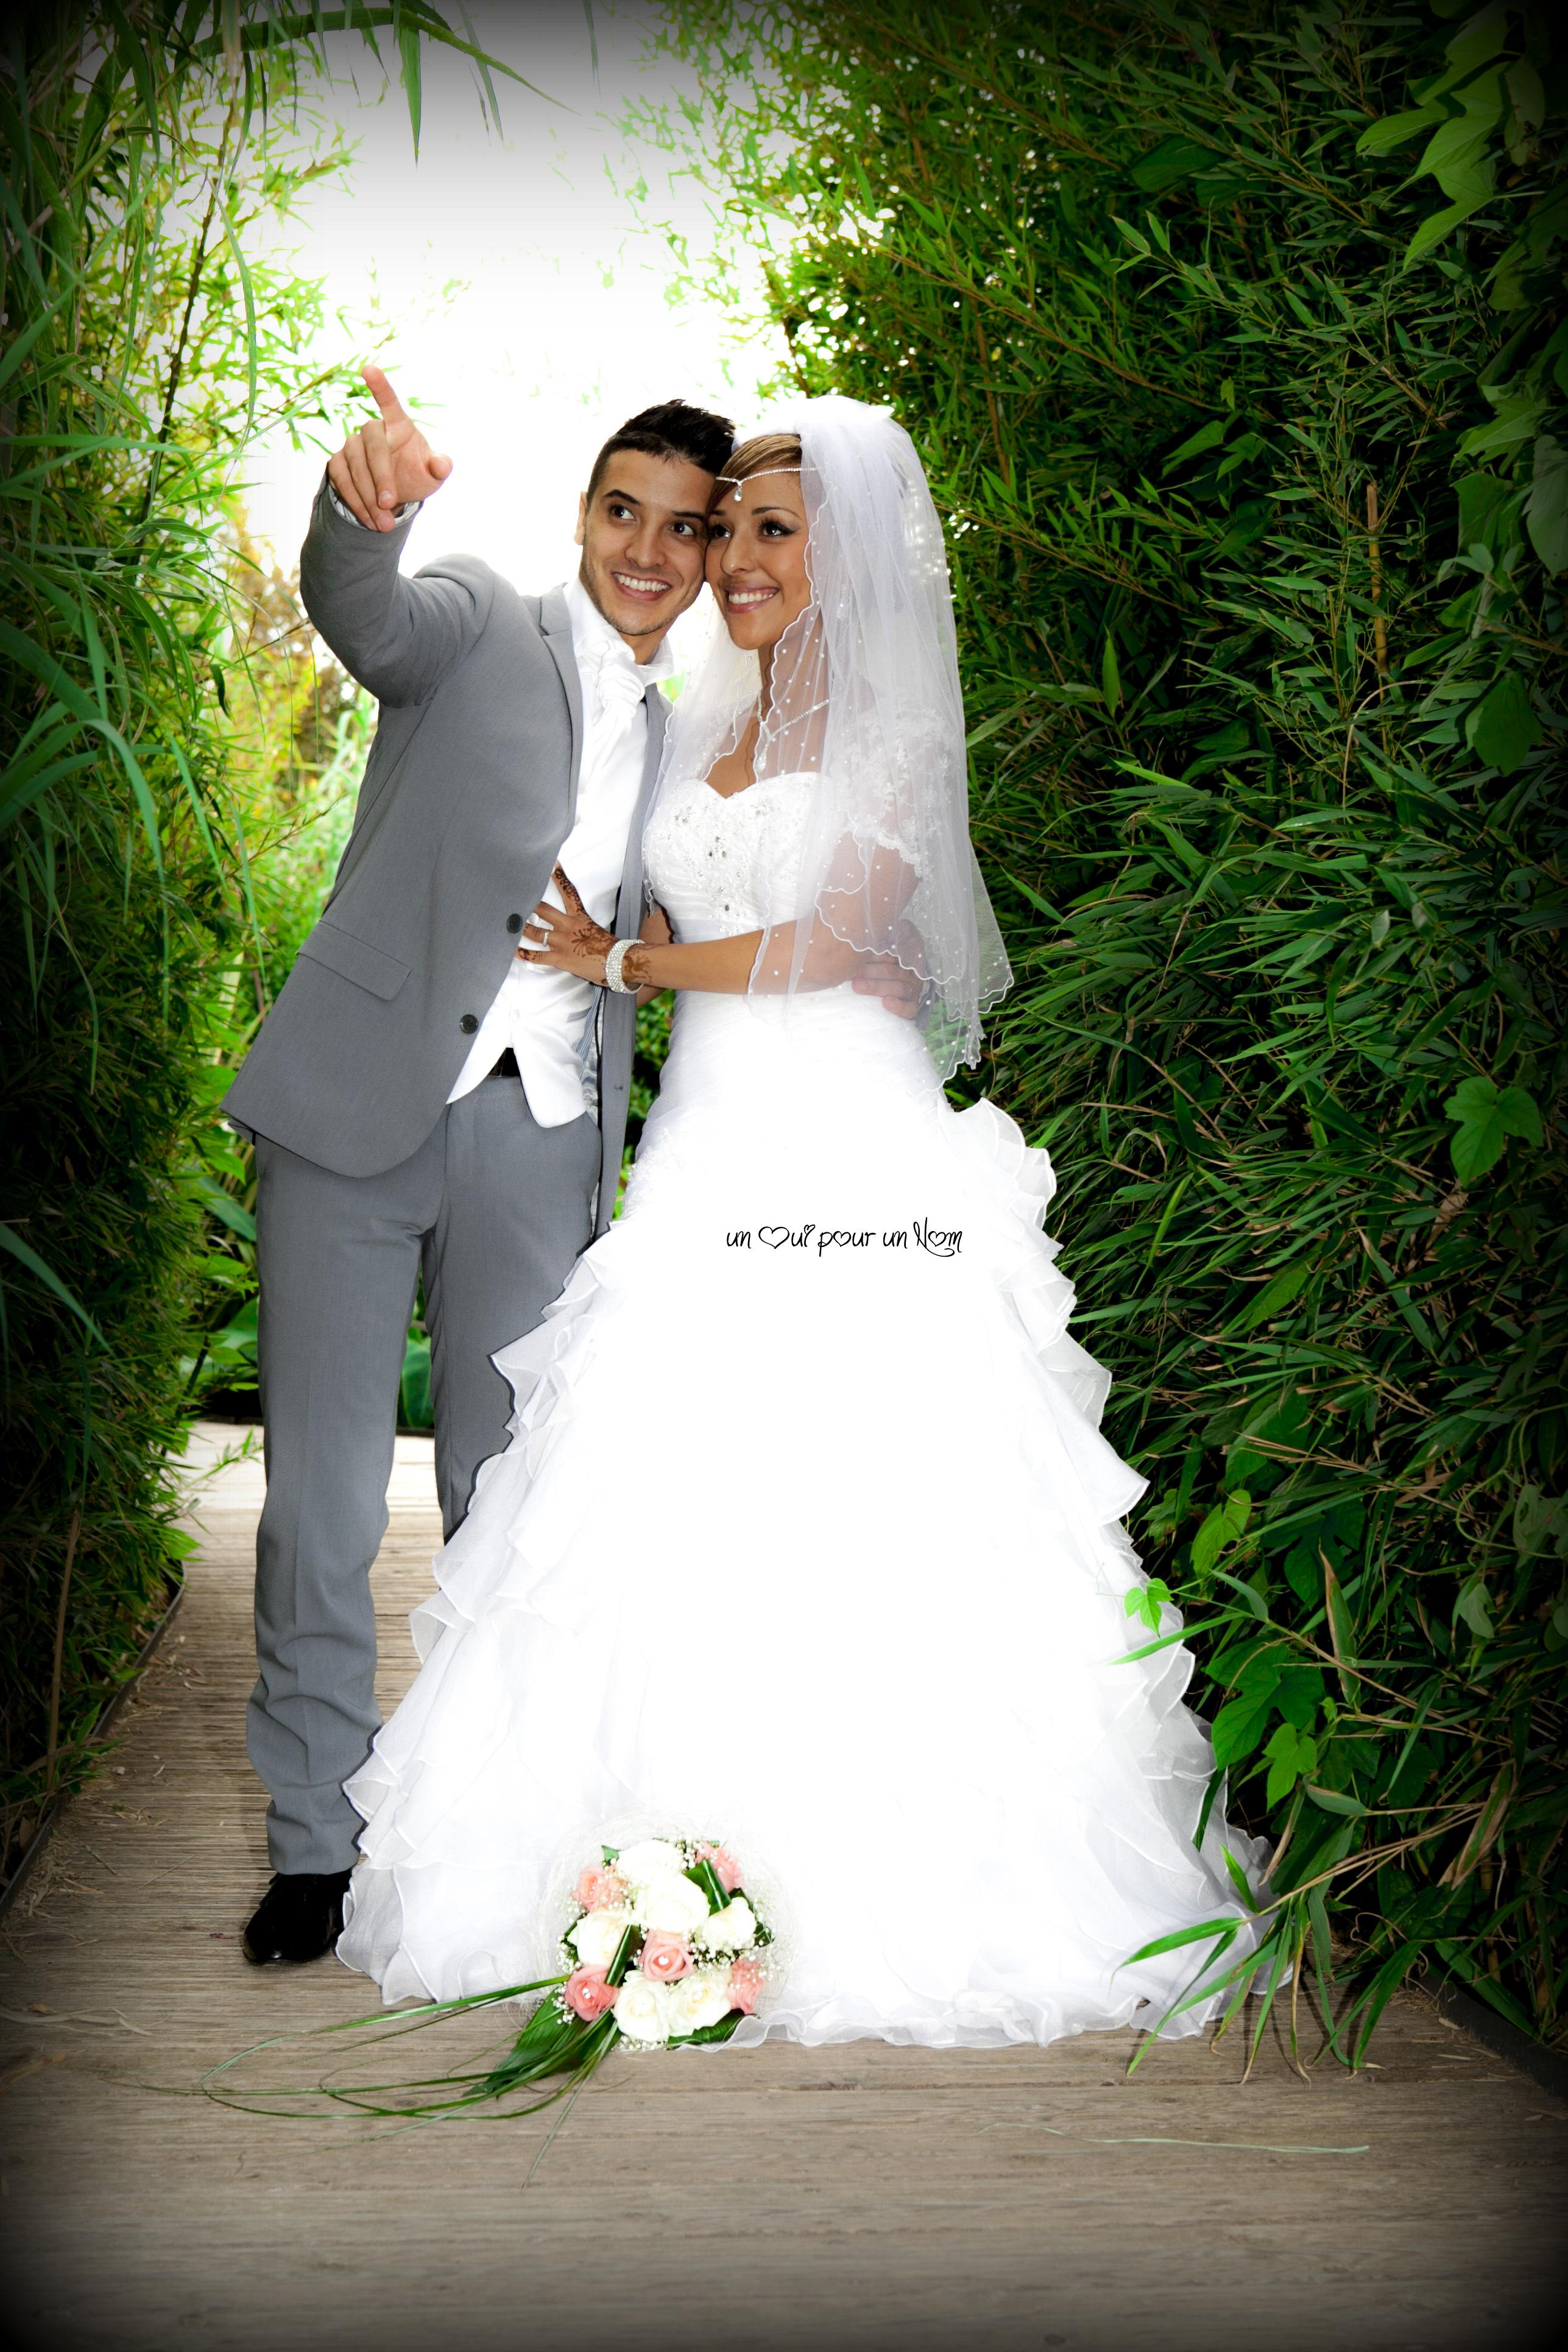 photographe cameraman mariage oriental arabe maghreb perpignan - Photographe Mariage Oriental